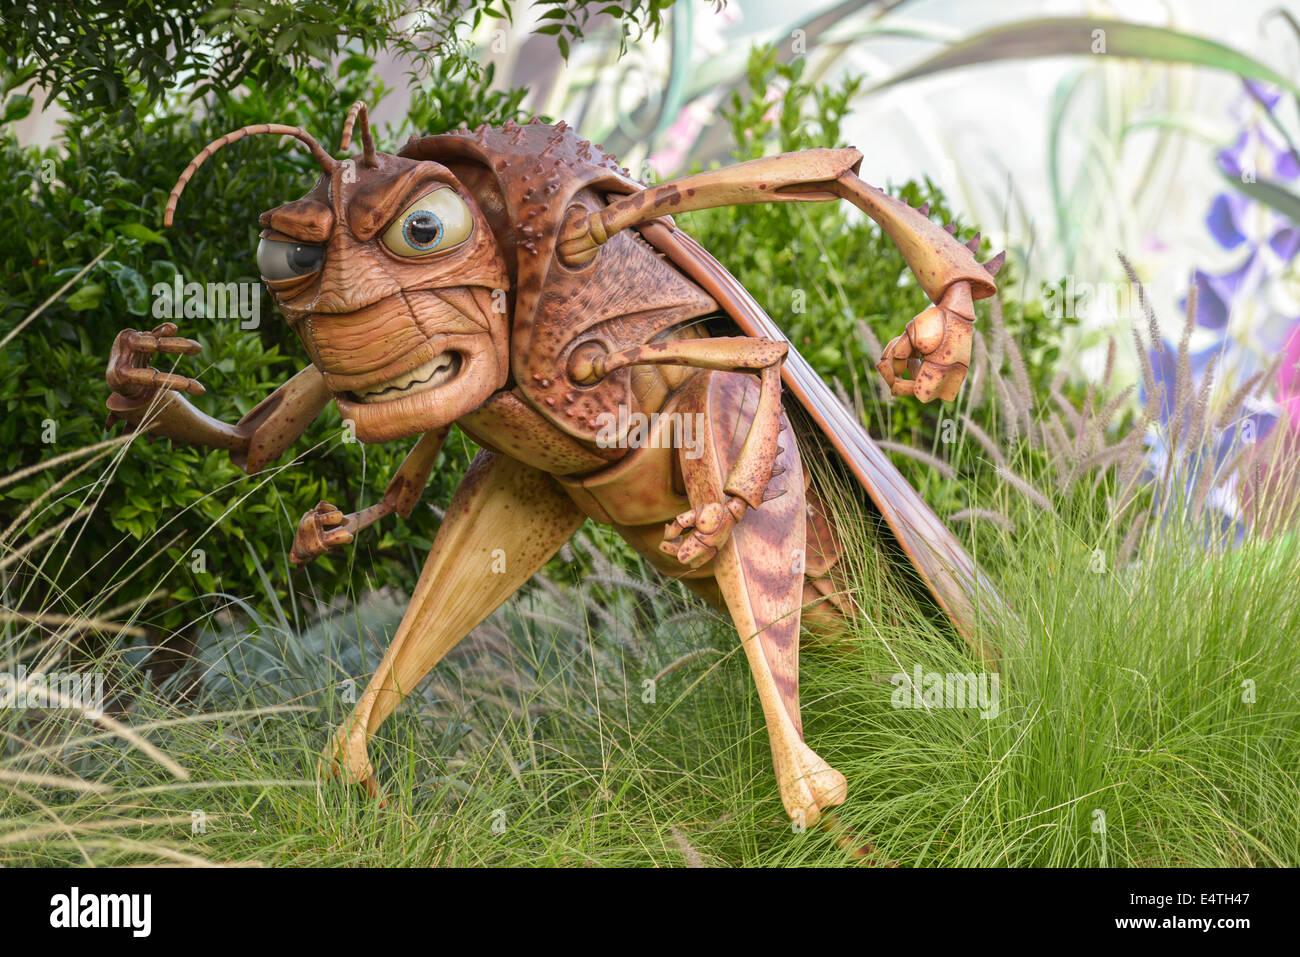 Hopper, Bug's Life, Disneyland, Anaheim, Californie Photo Stock